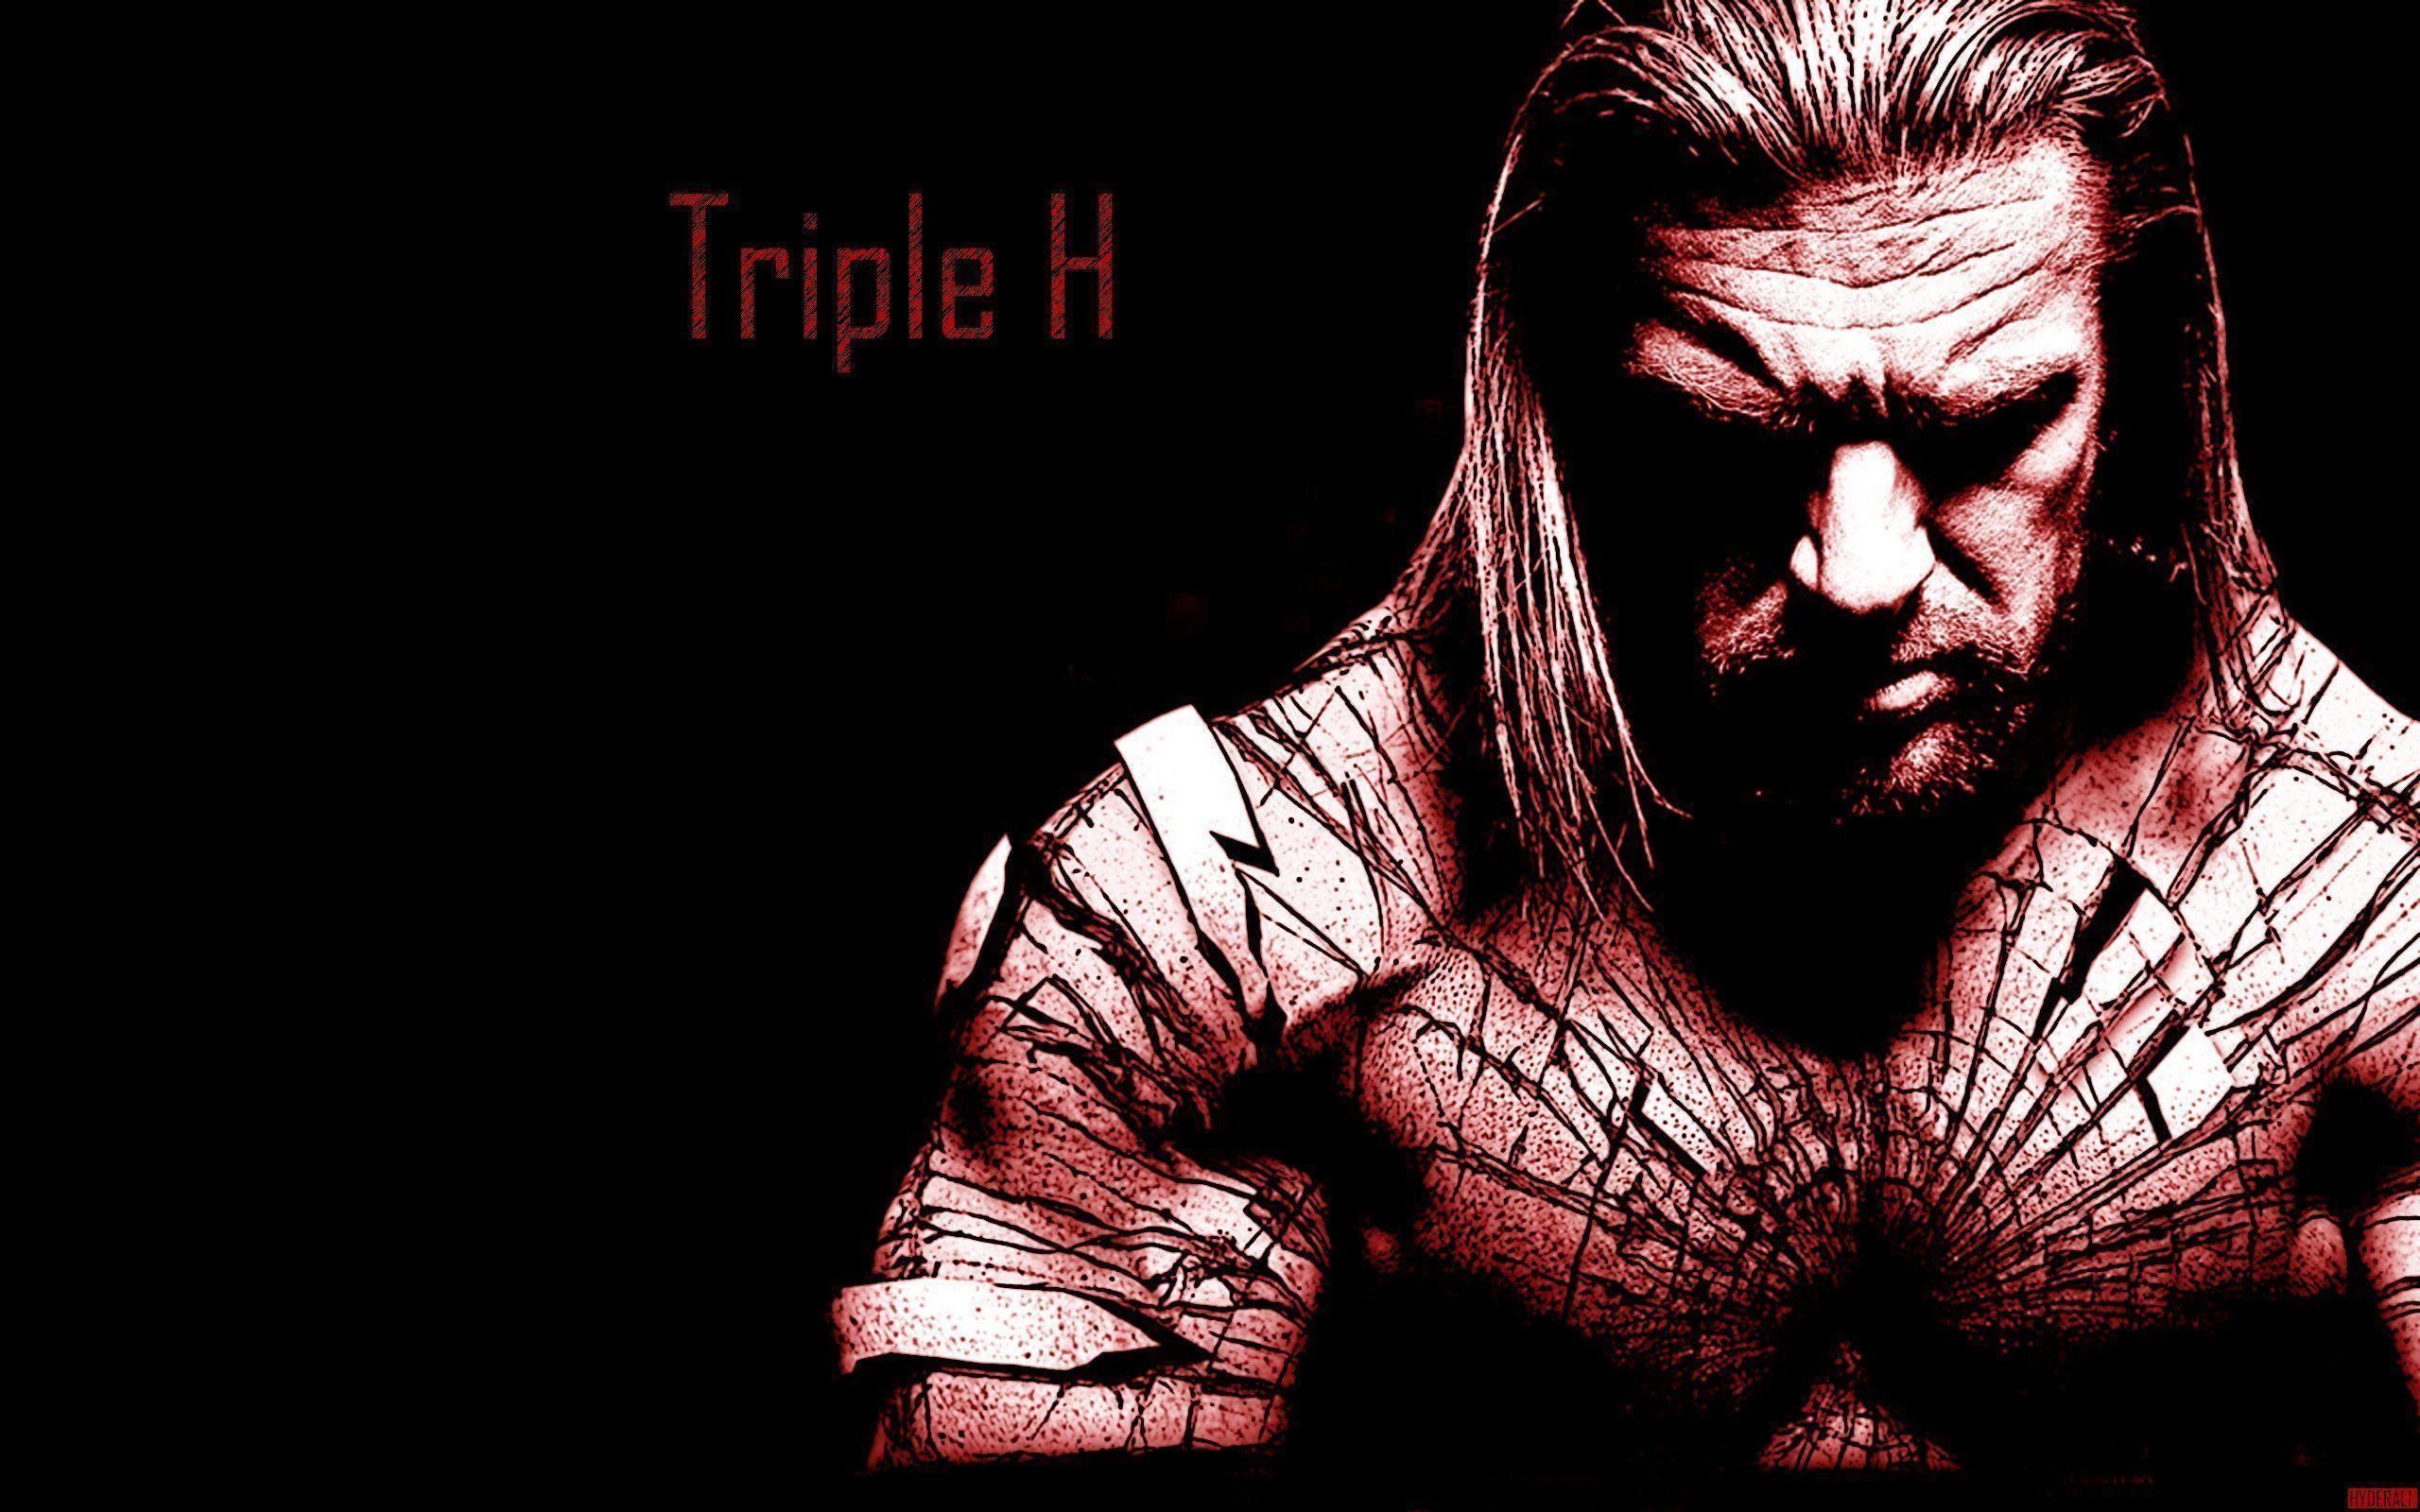 Triple H Wwe The Game Hd Wallpaper